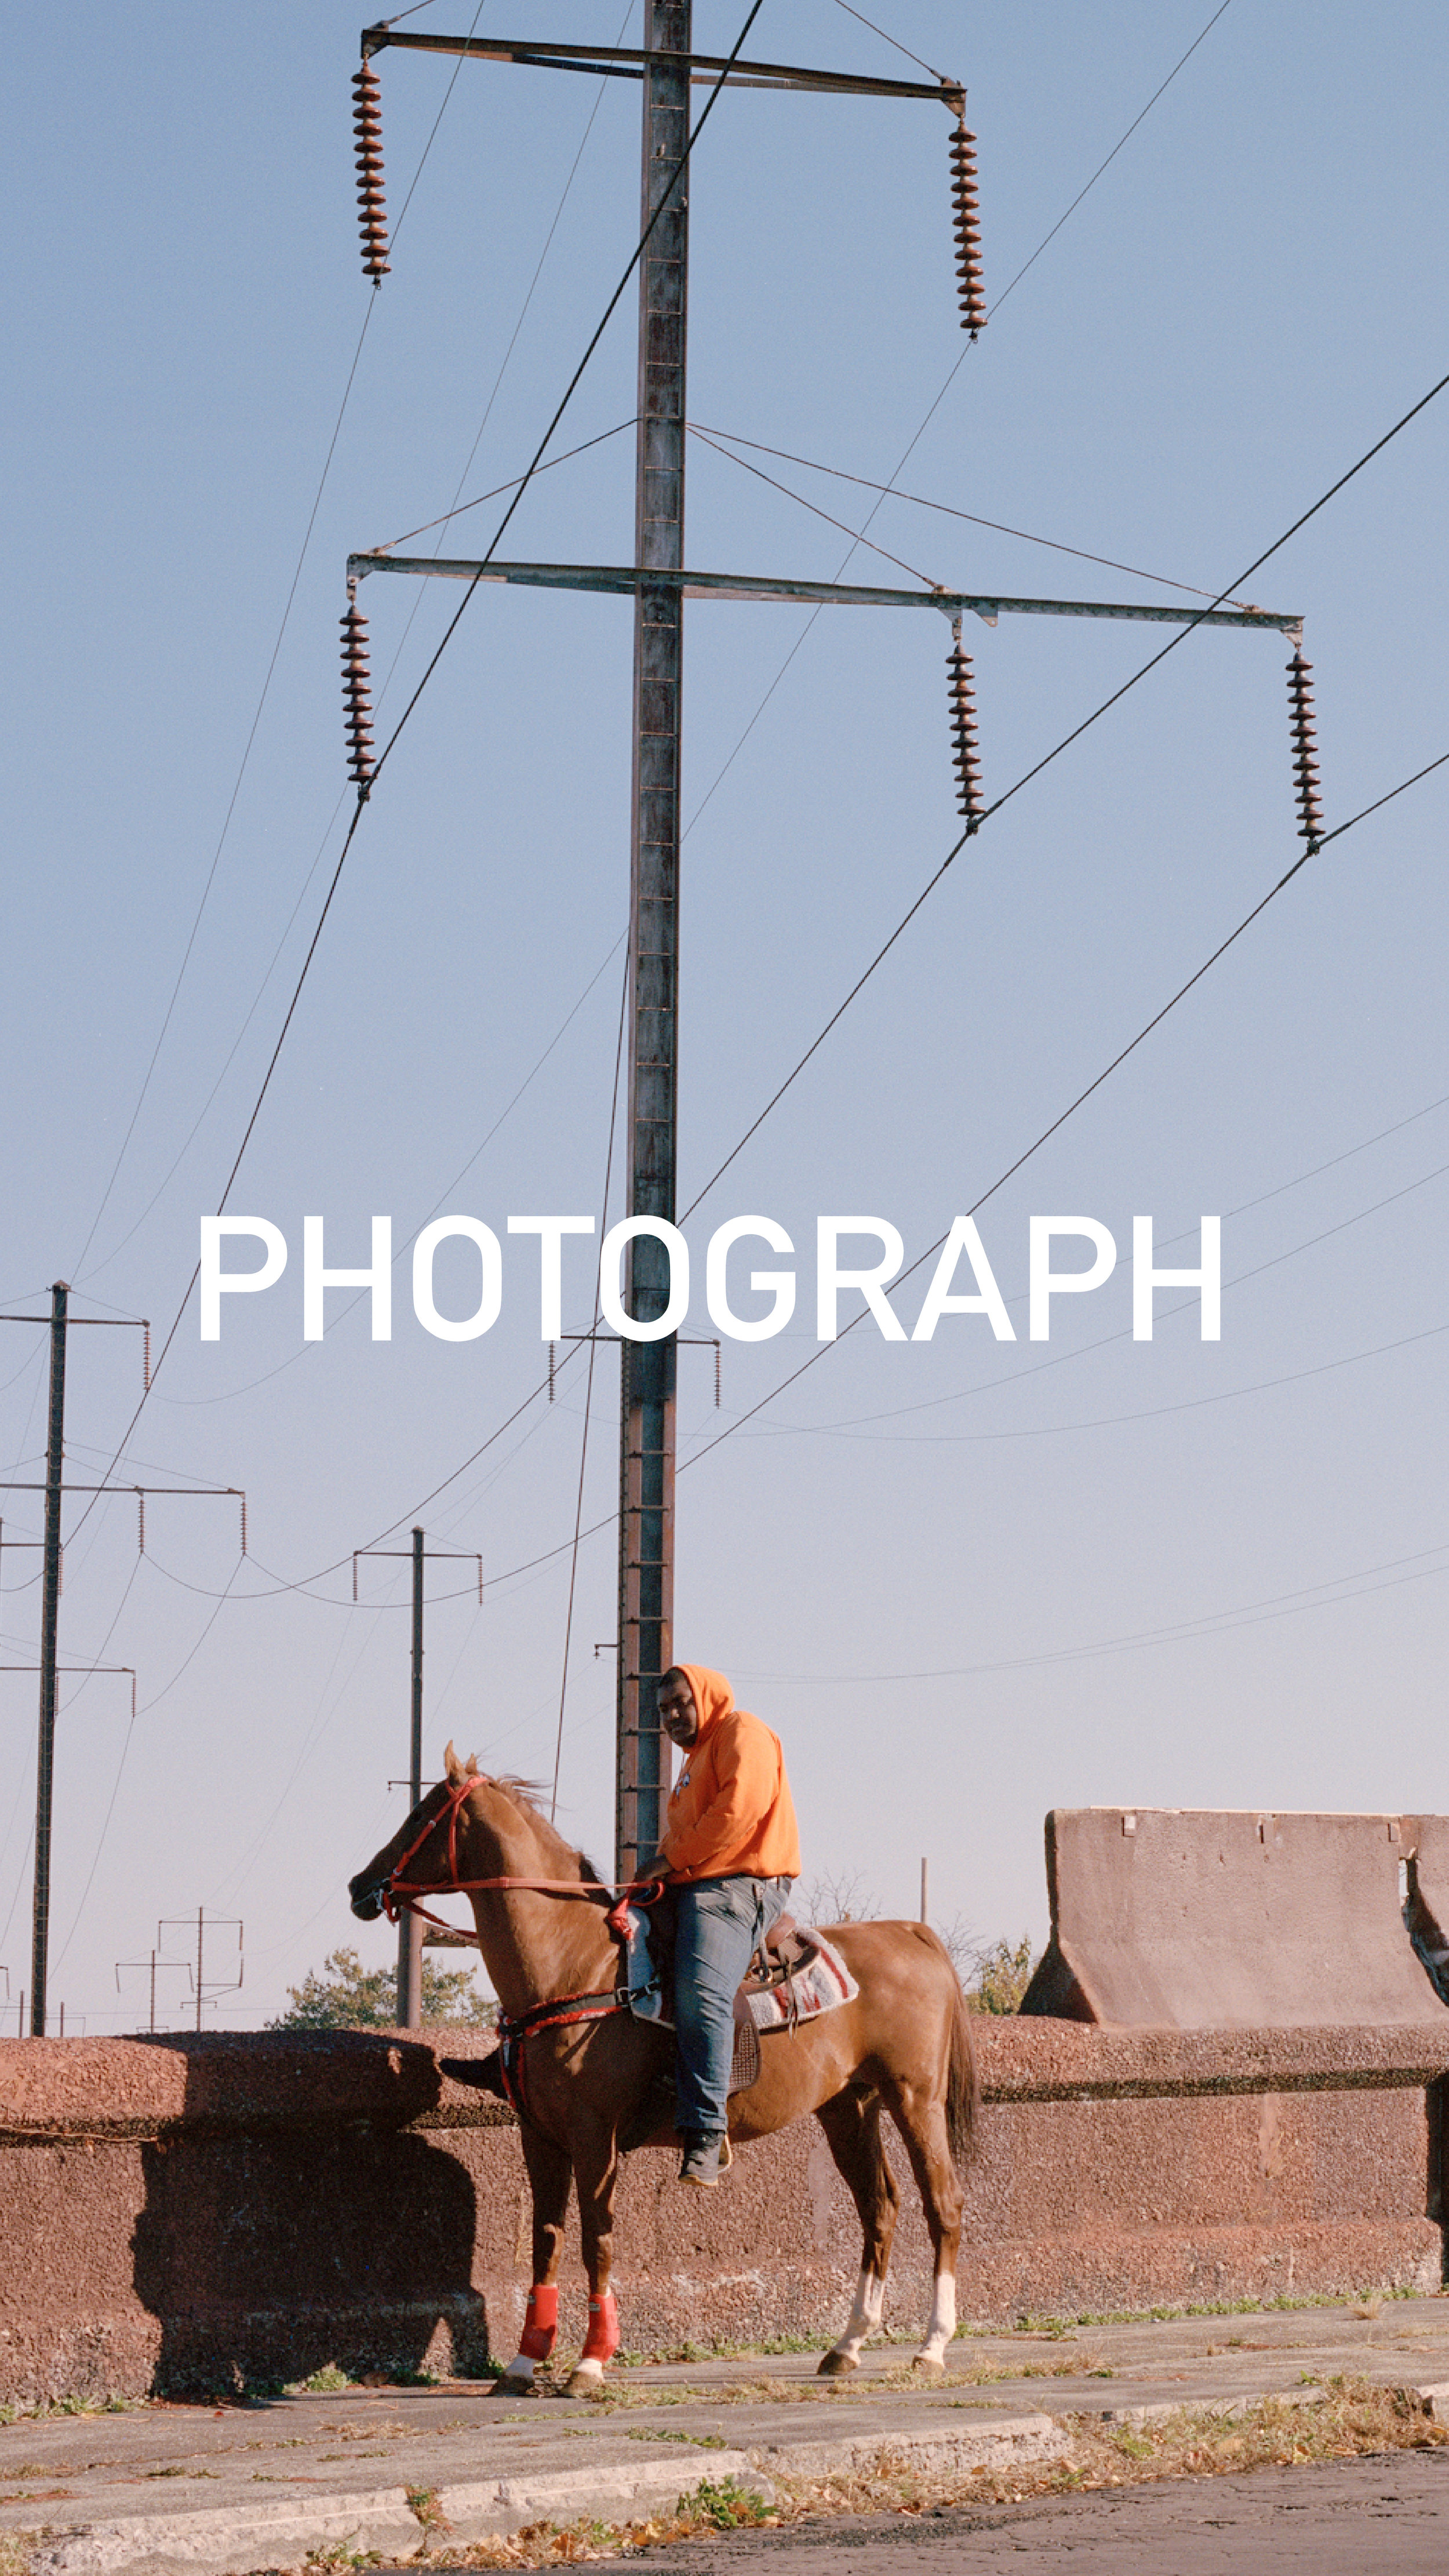 PHOTOGRAPH CIAN.jpg